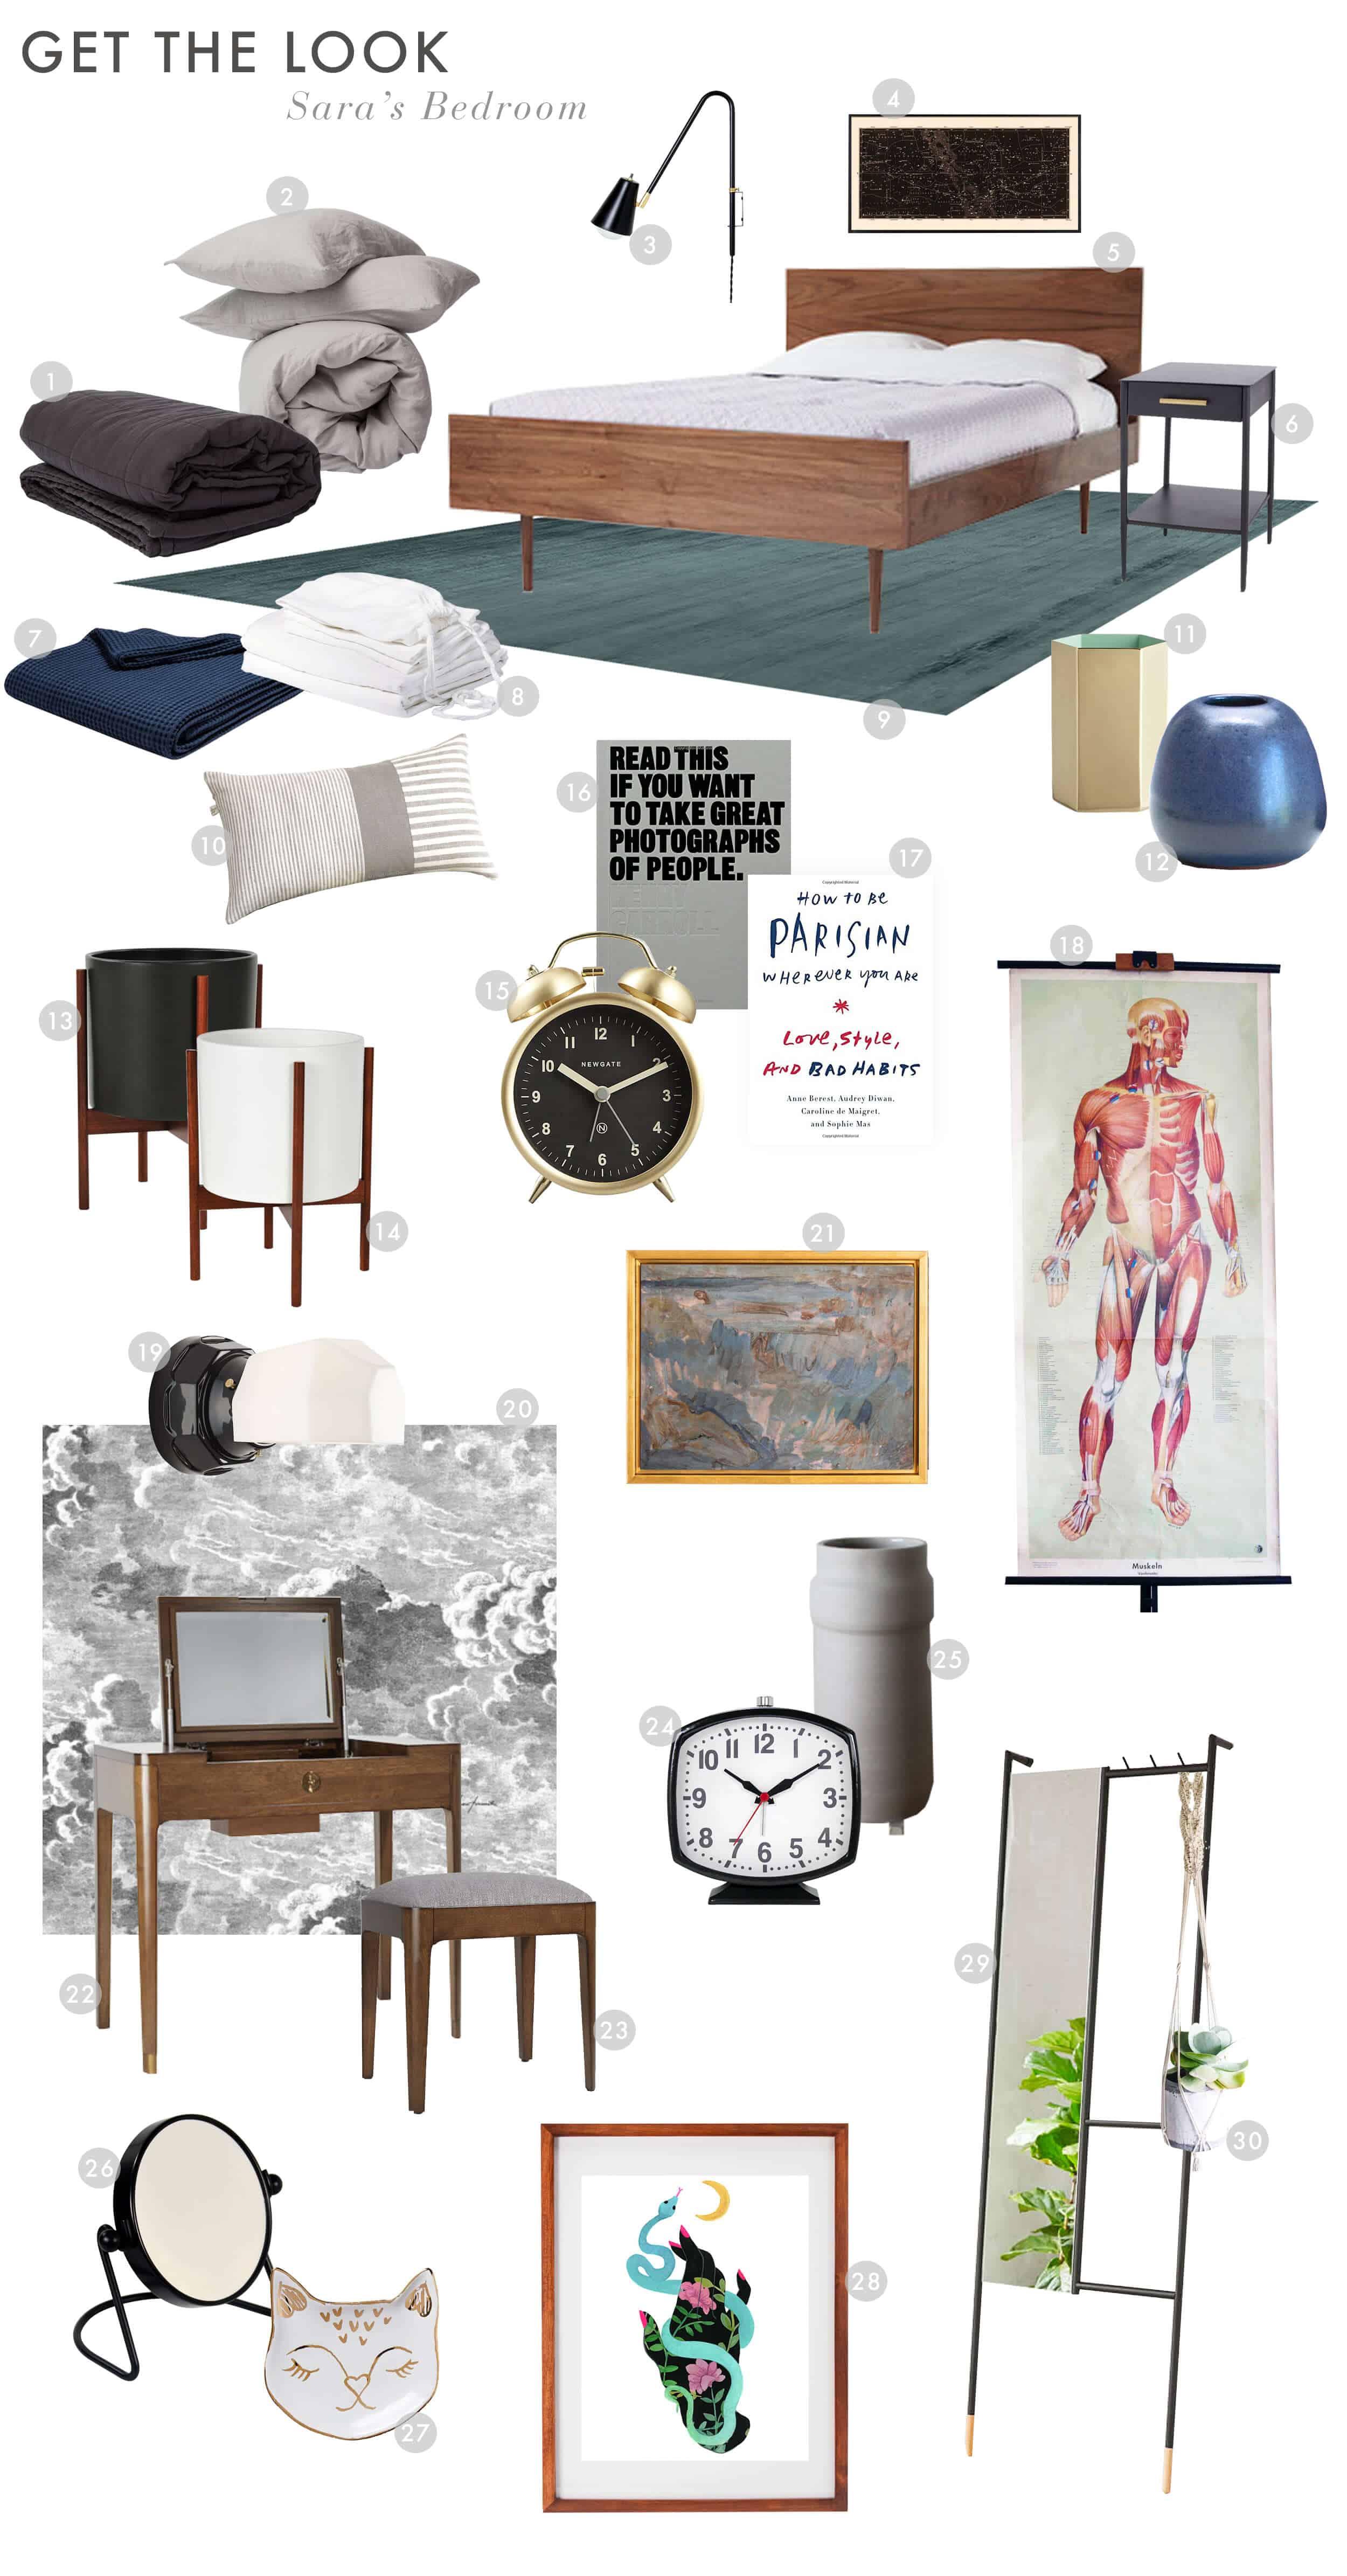 Emily-Henderson_Sara_MOTO_Bedroom_Modern_Eclectic_Neutral_Get-the-Look